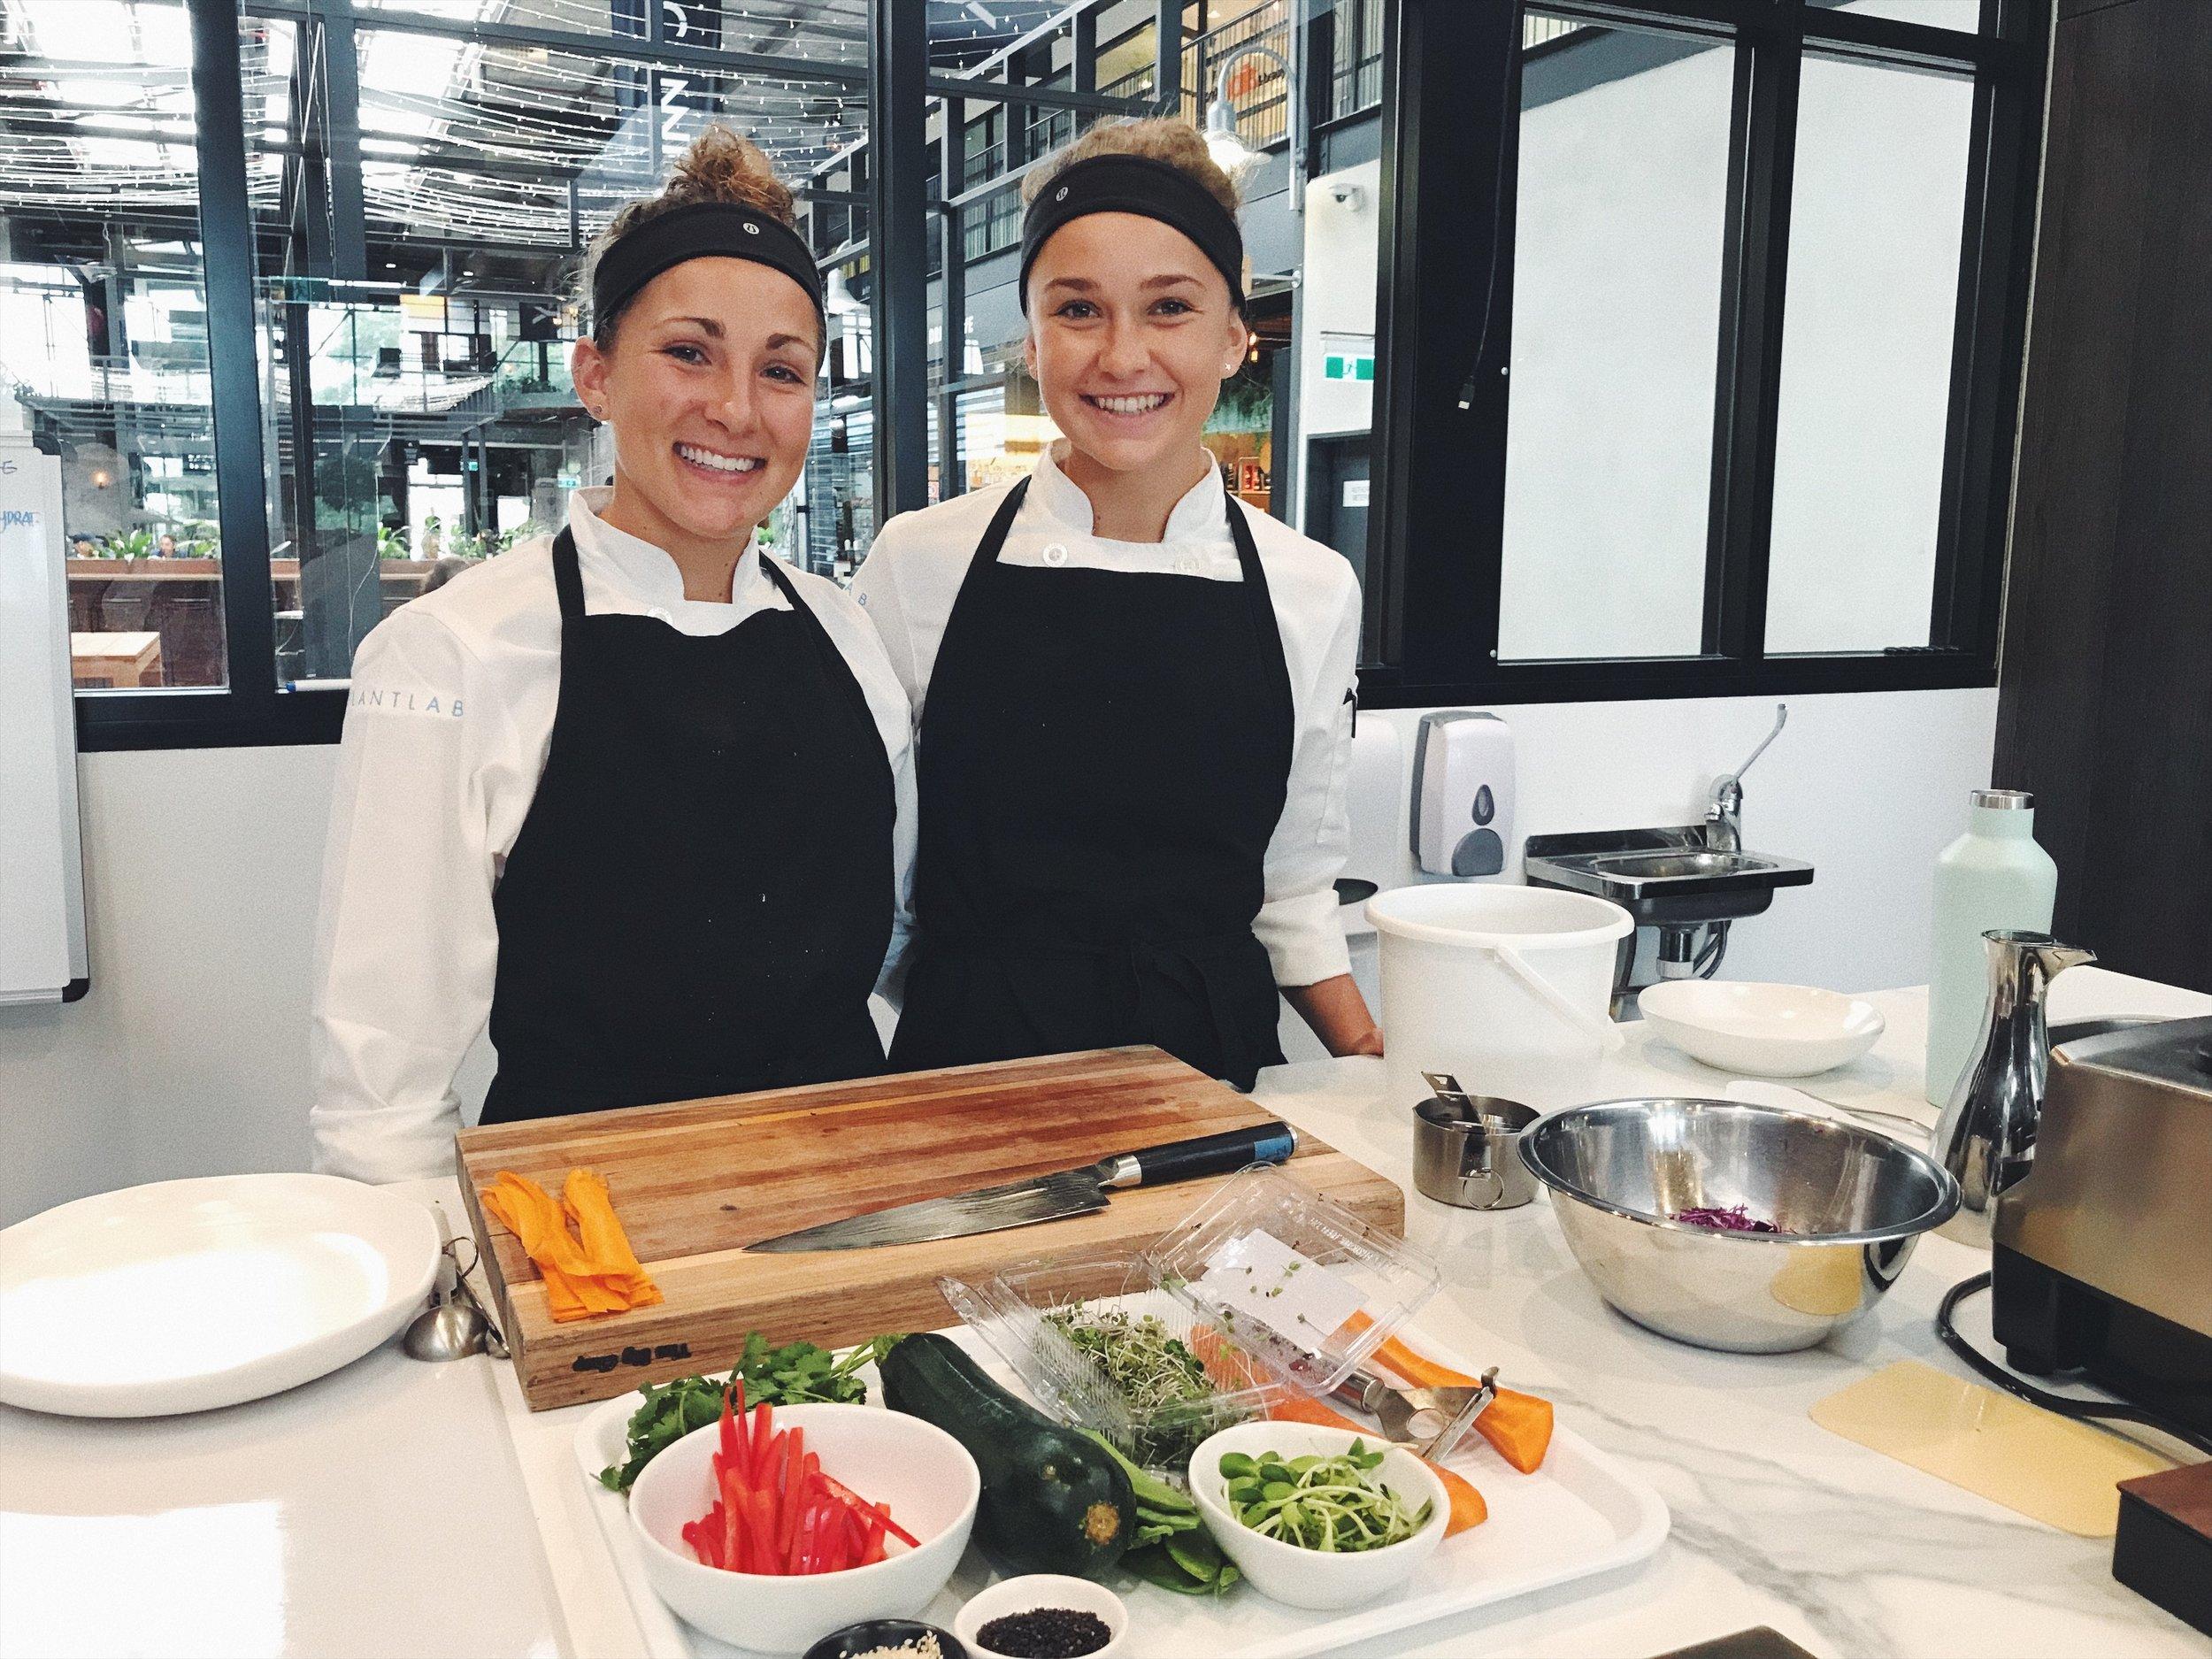 Instructing Level 1 at PlantLab Culinary in Sydney 2018